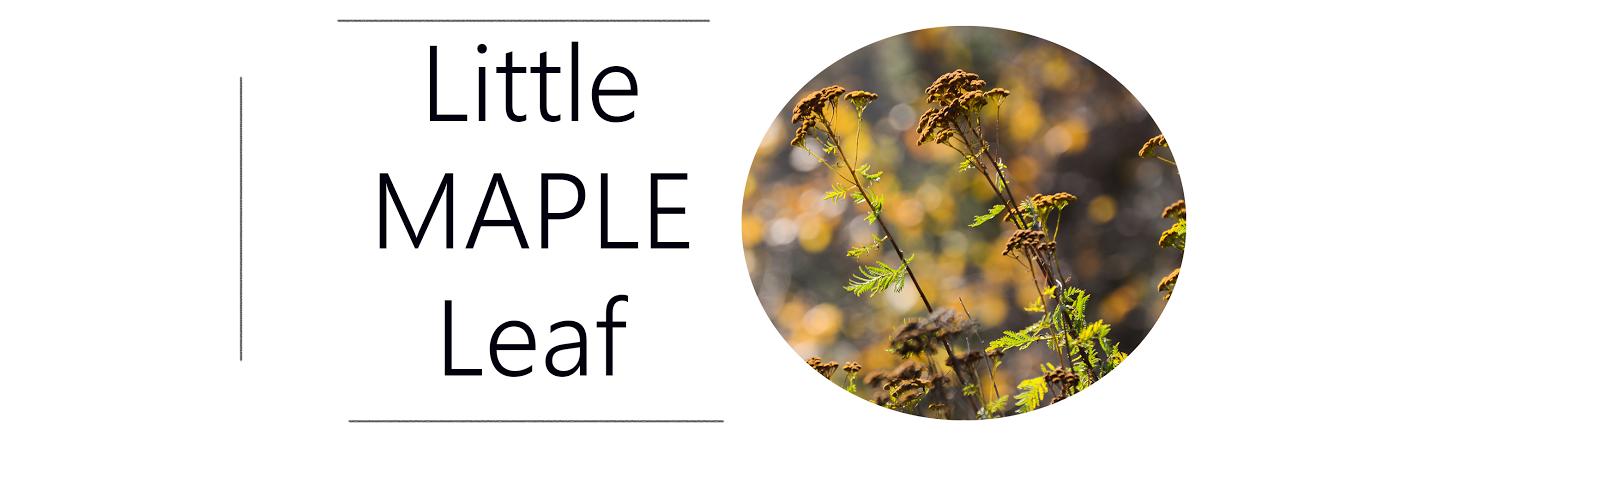 little maple leaf